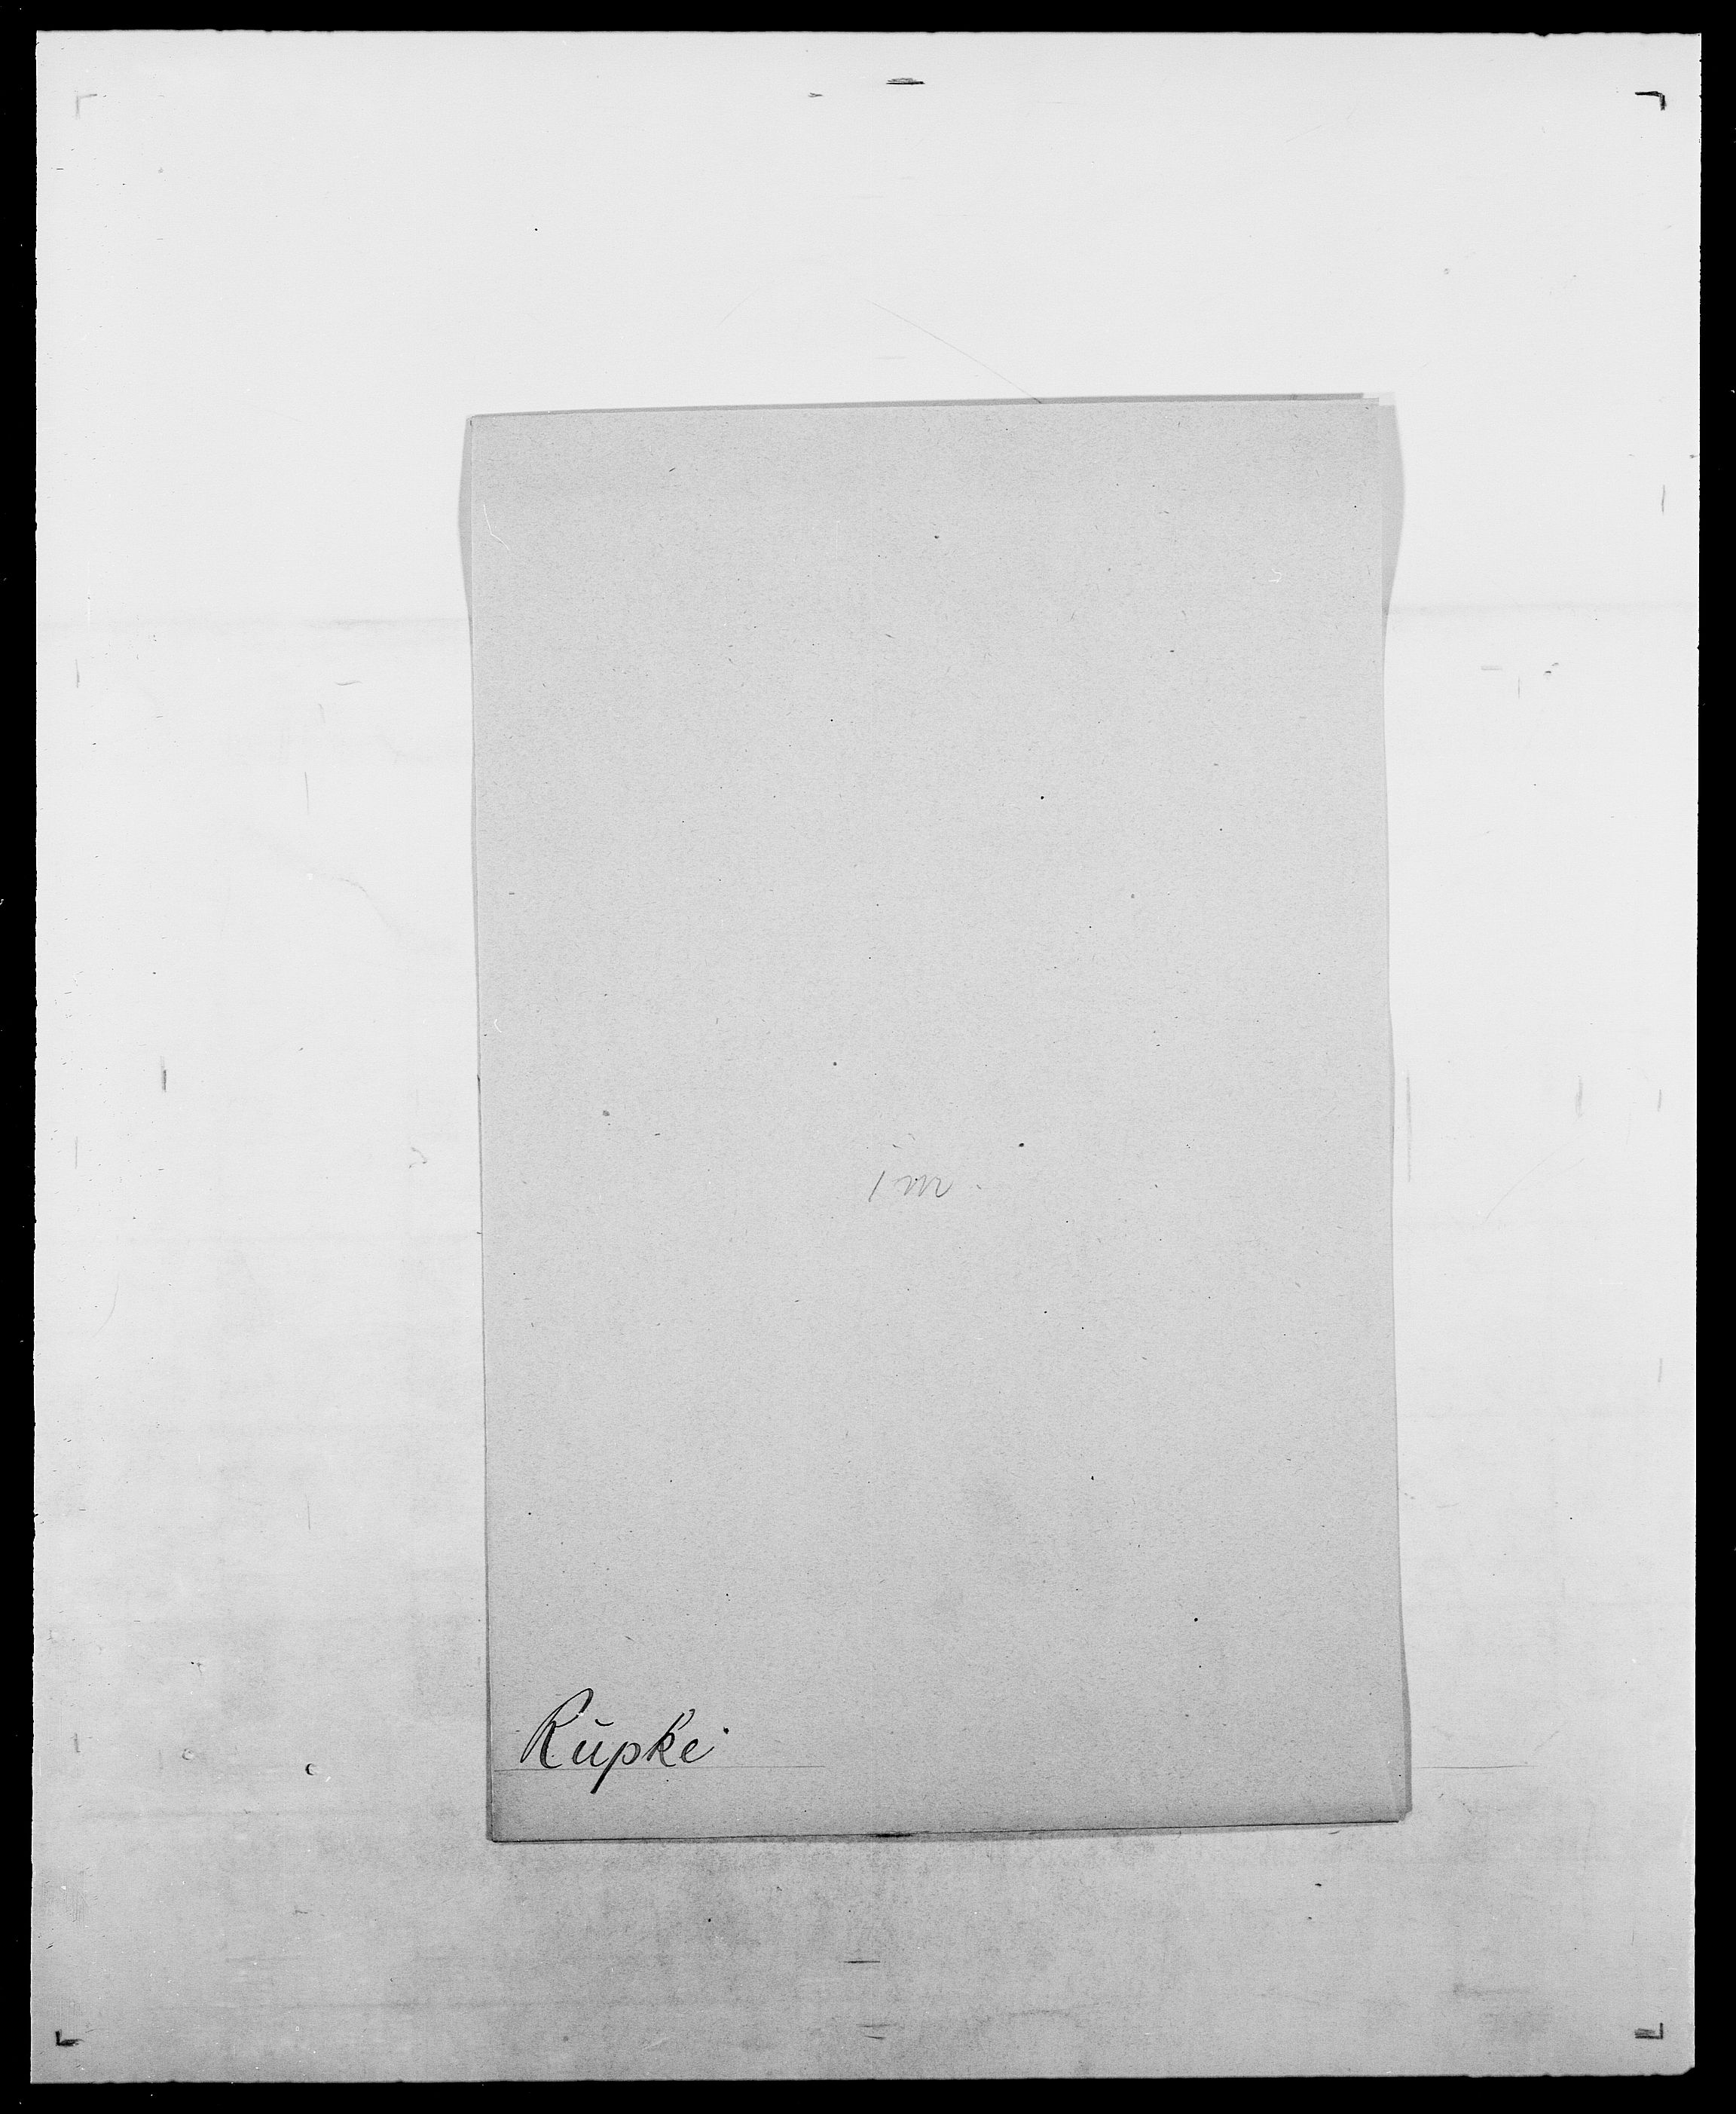 SAO, Delgobe, Charles Antoine - samling, D/Da/L0033: Roald - Røyem, s. 470